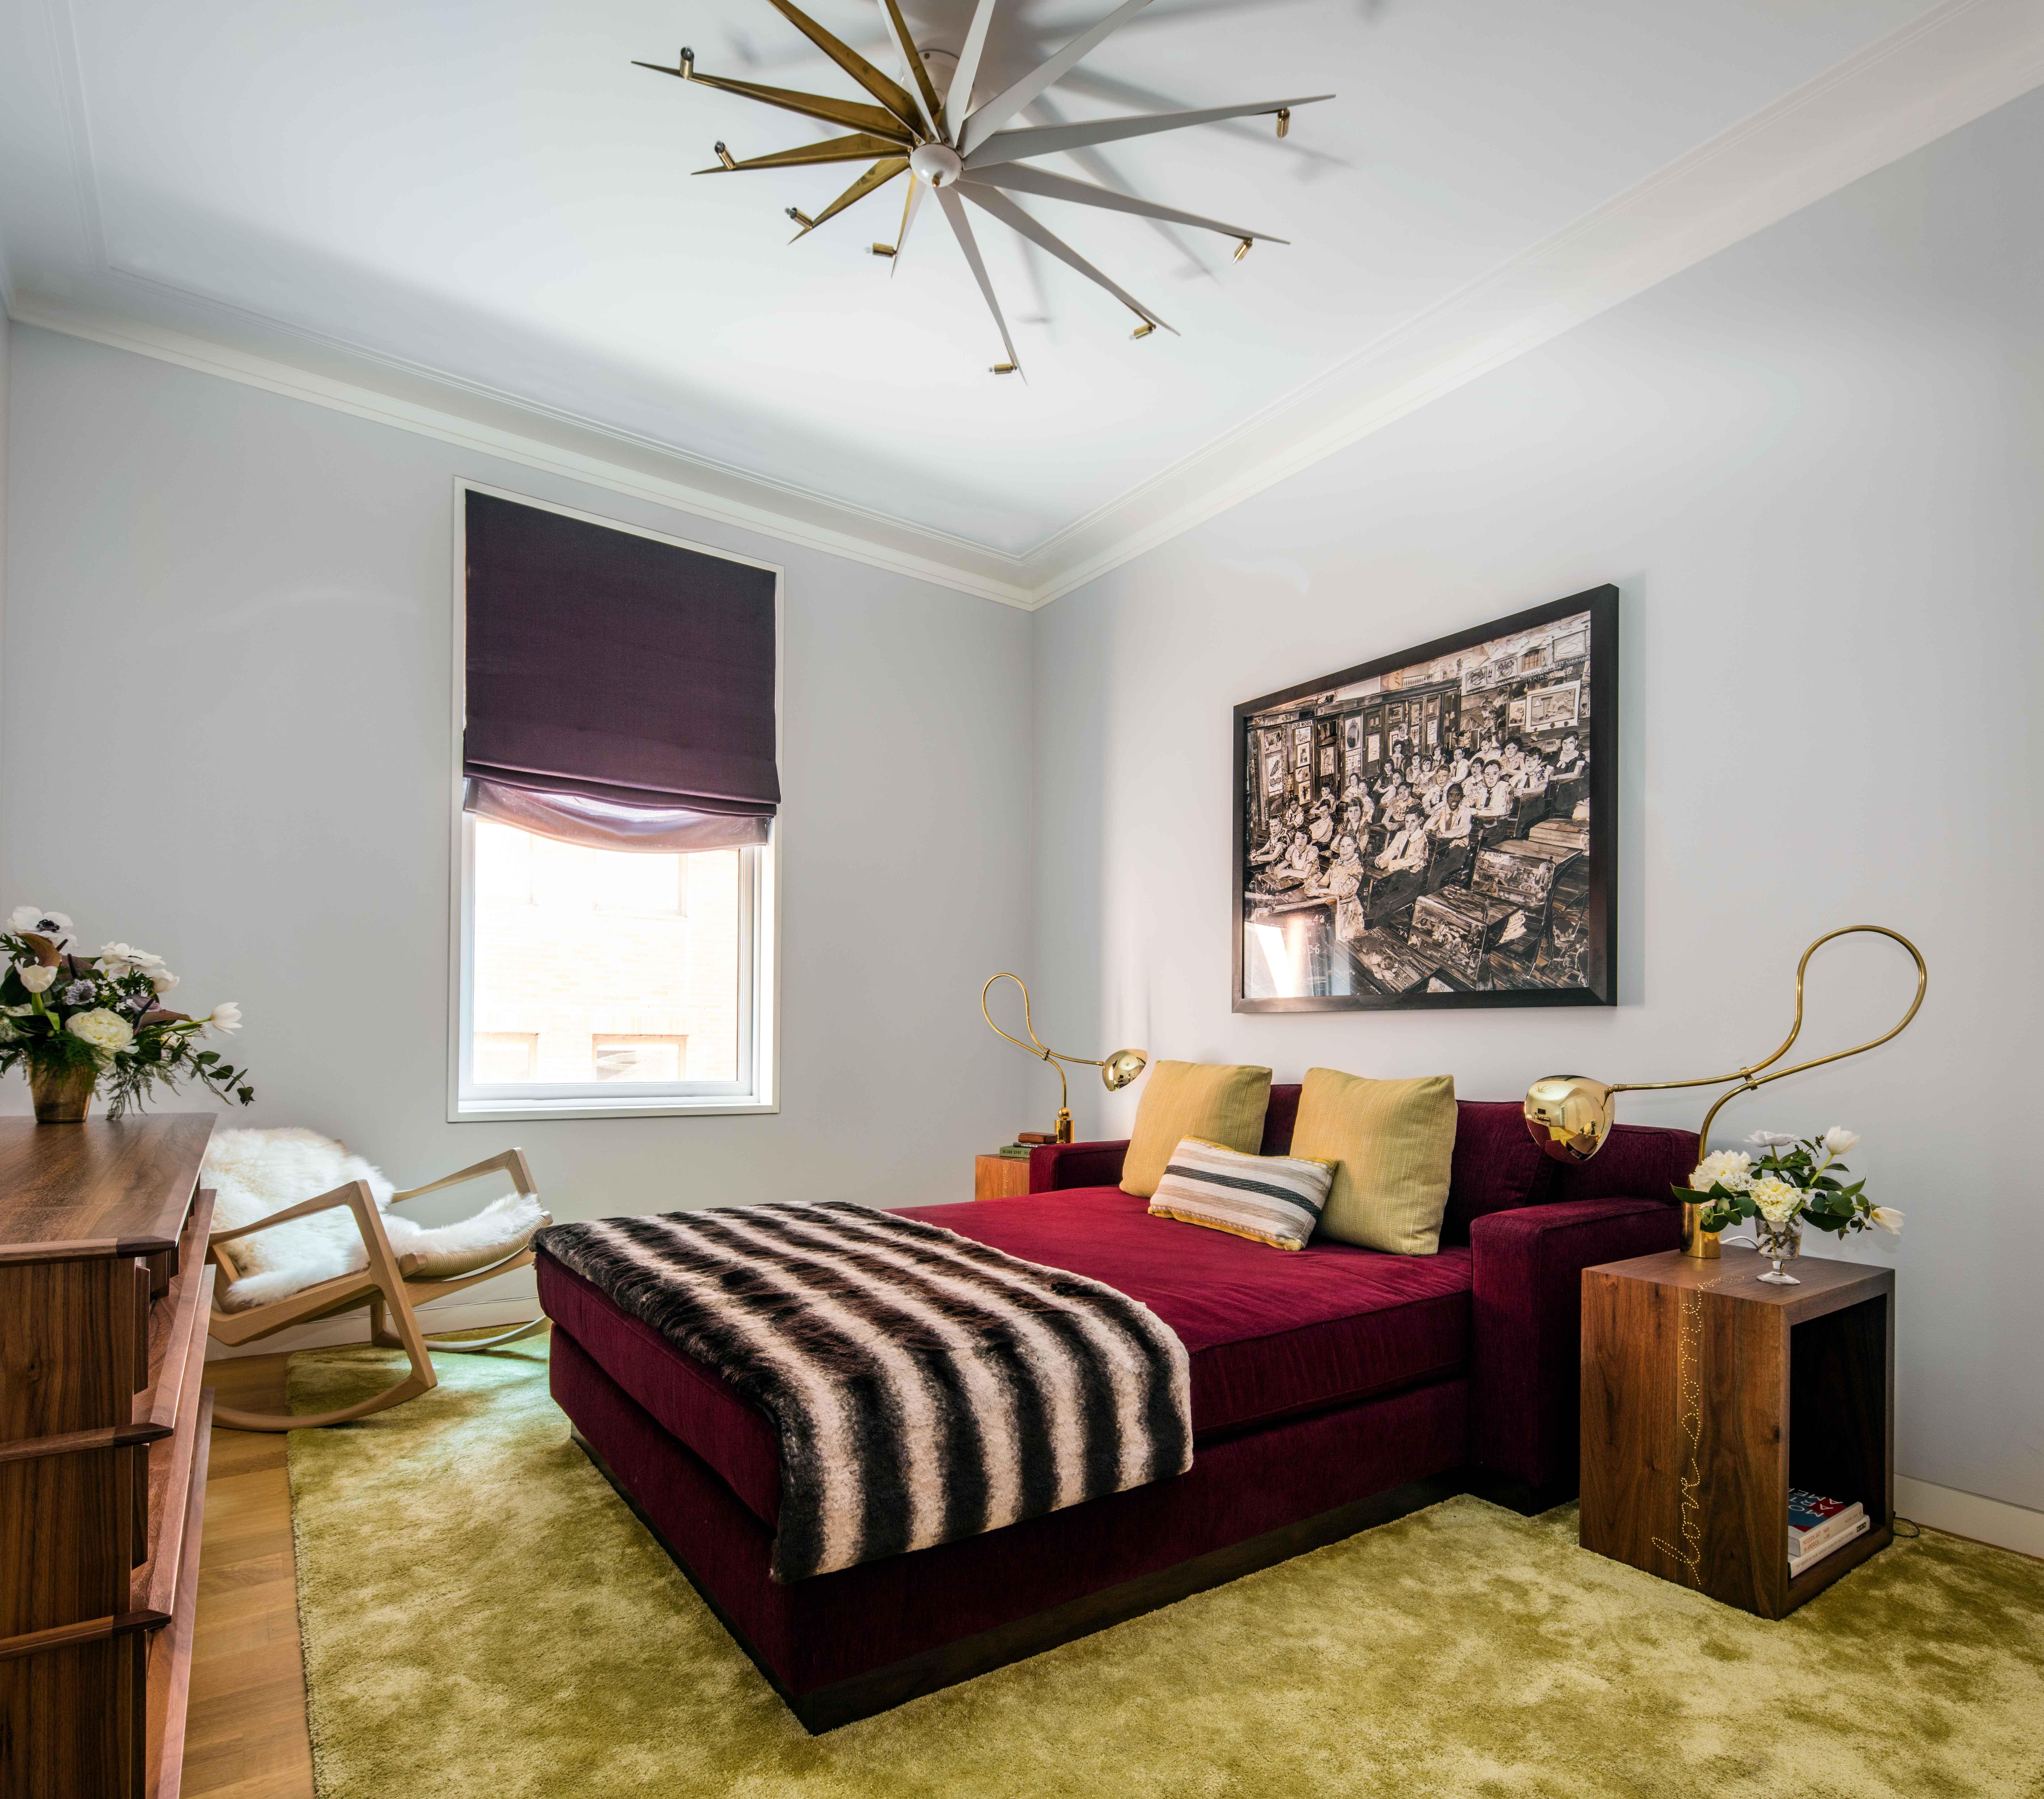 7-harrison-bedroom-nicole-fuller-2